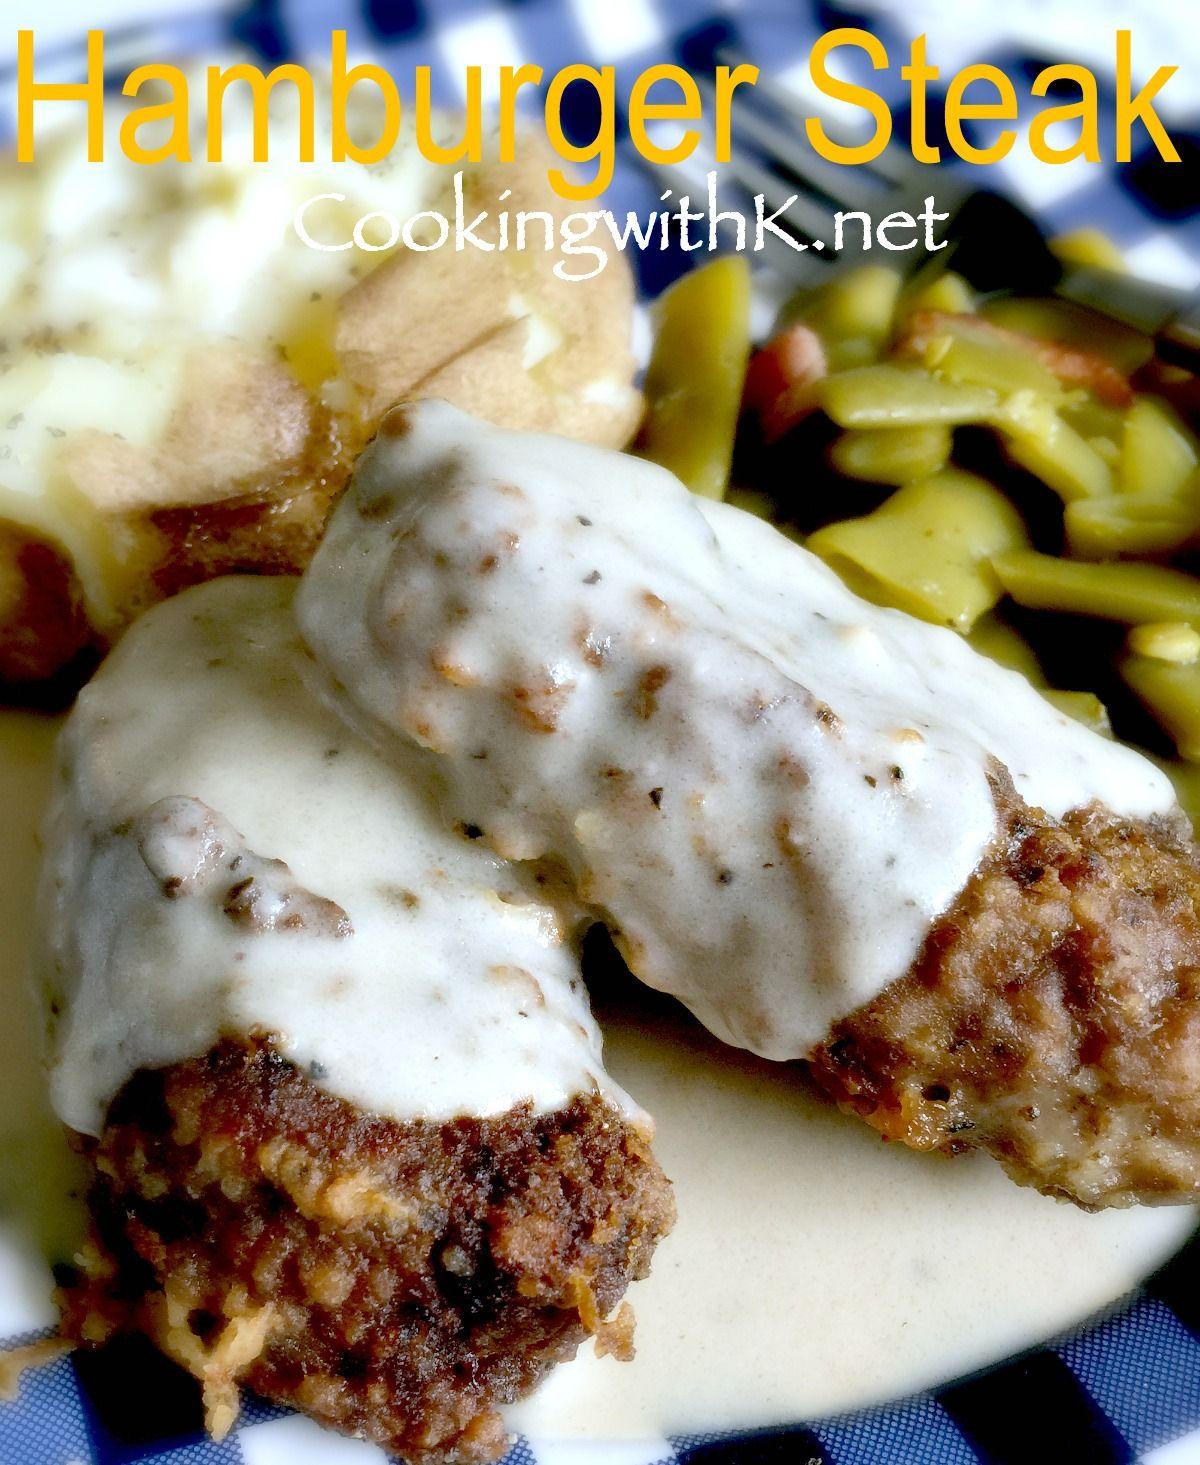 Chicken Fried Hamburger With White Gravy: Hamburger Steak With Creamy Gravy {Grandmother's Recipe